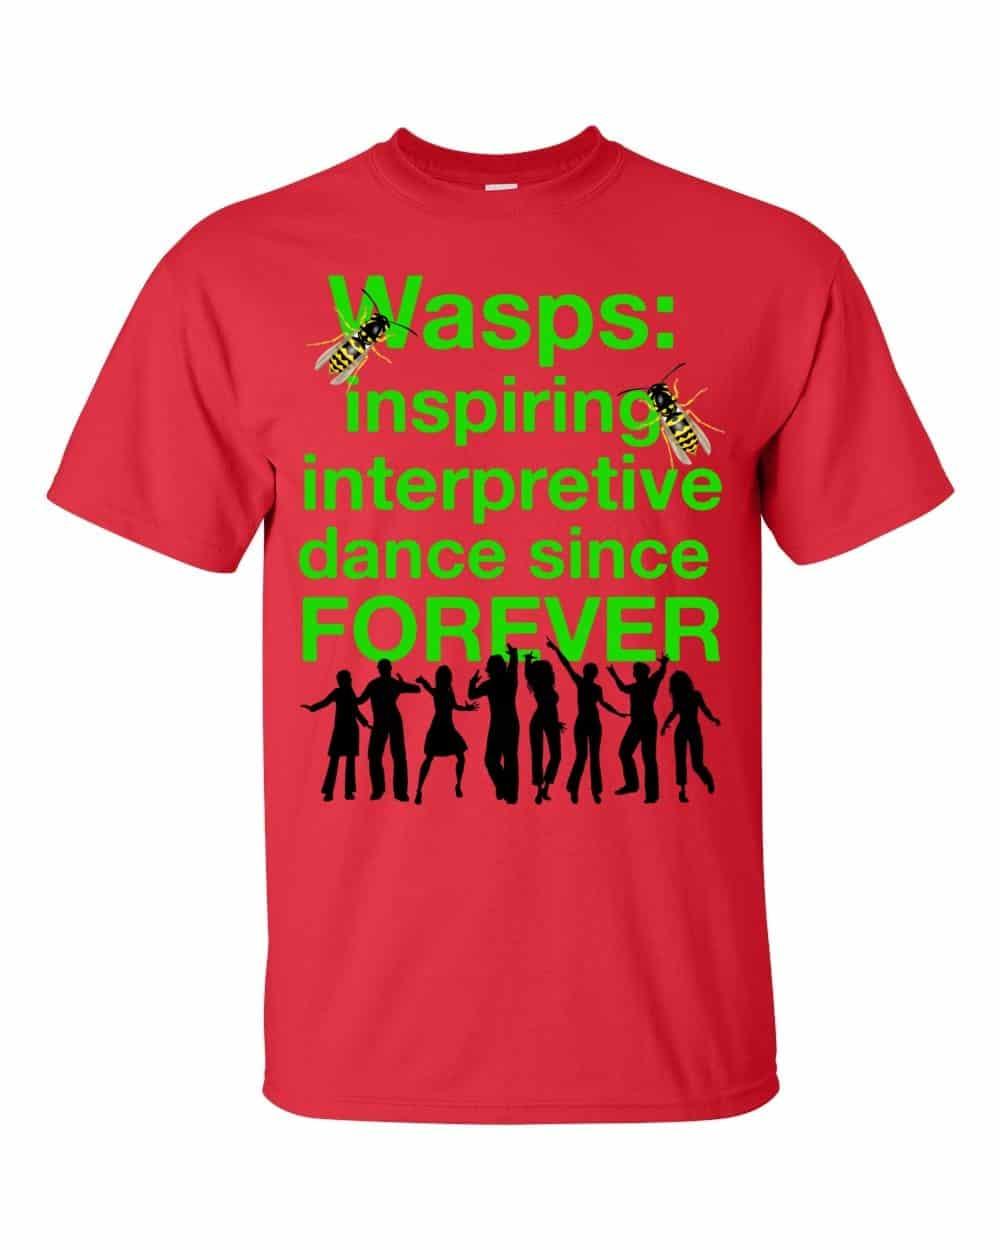 Wasps Inspire Interpretive Dance T-Shirt (red)